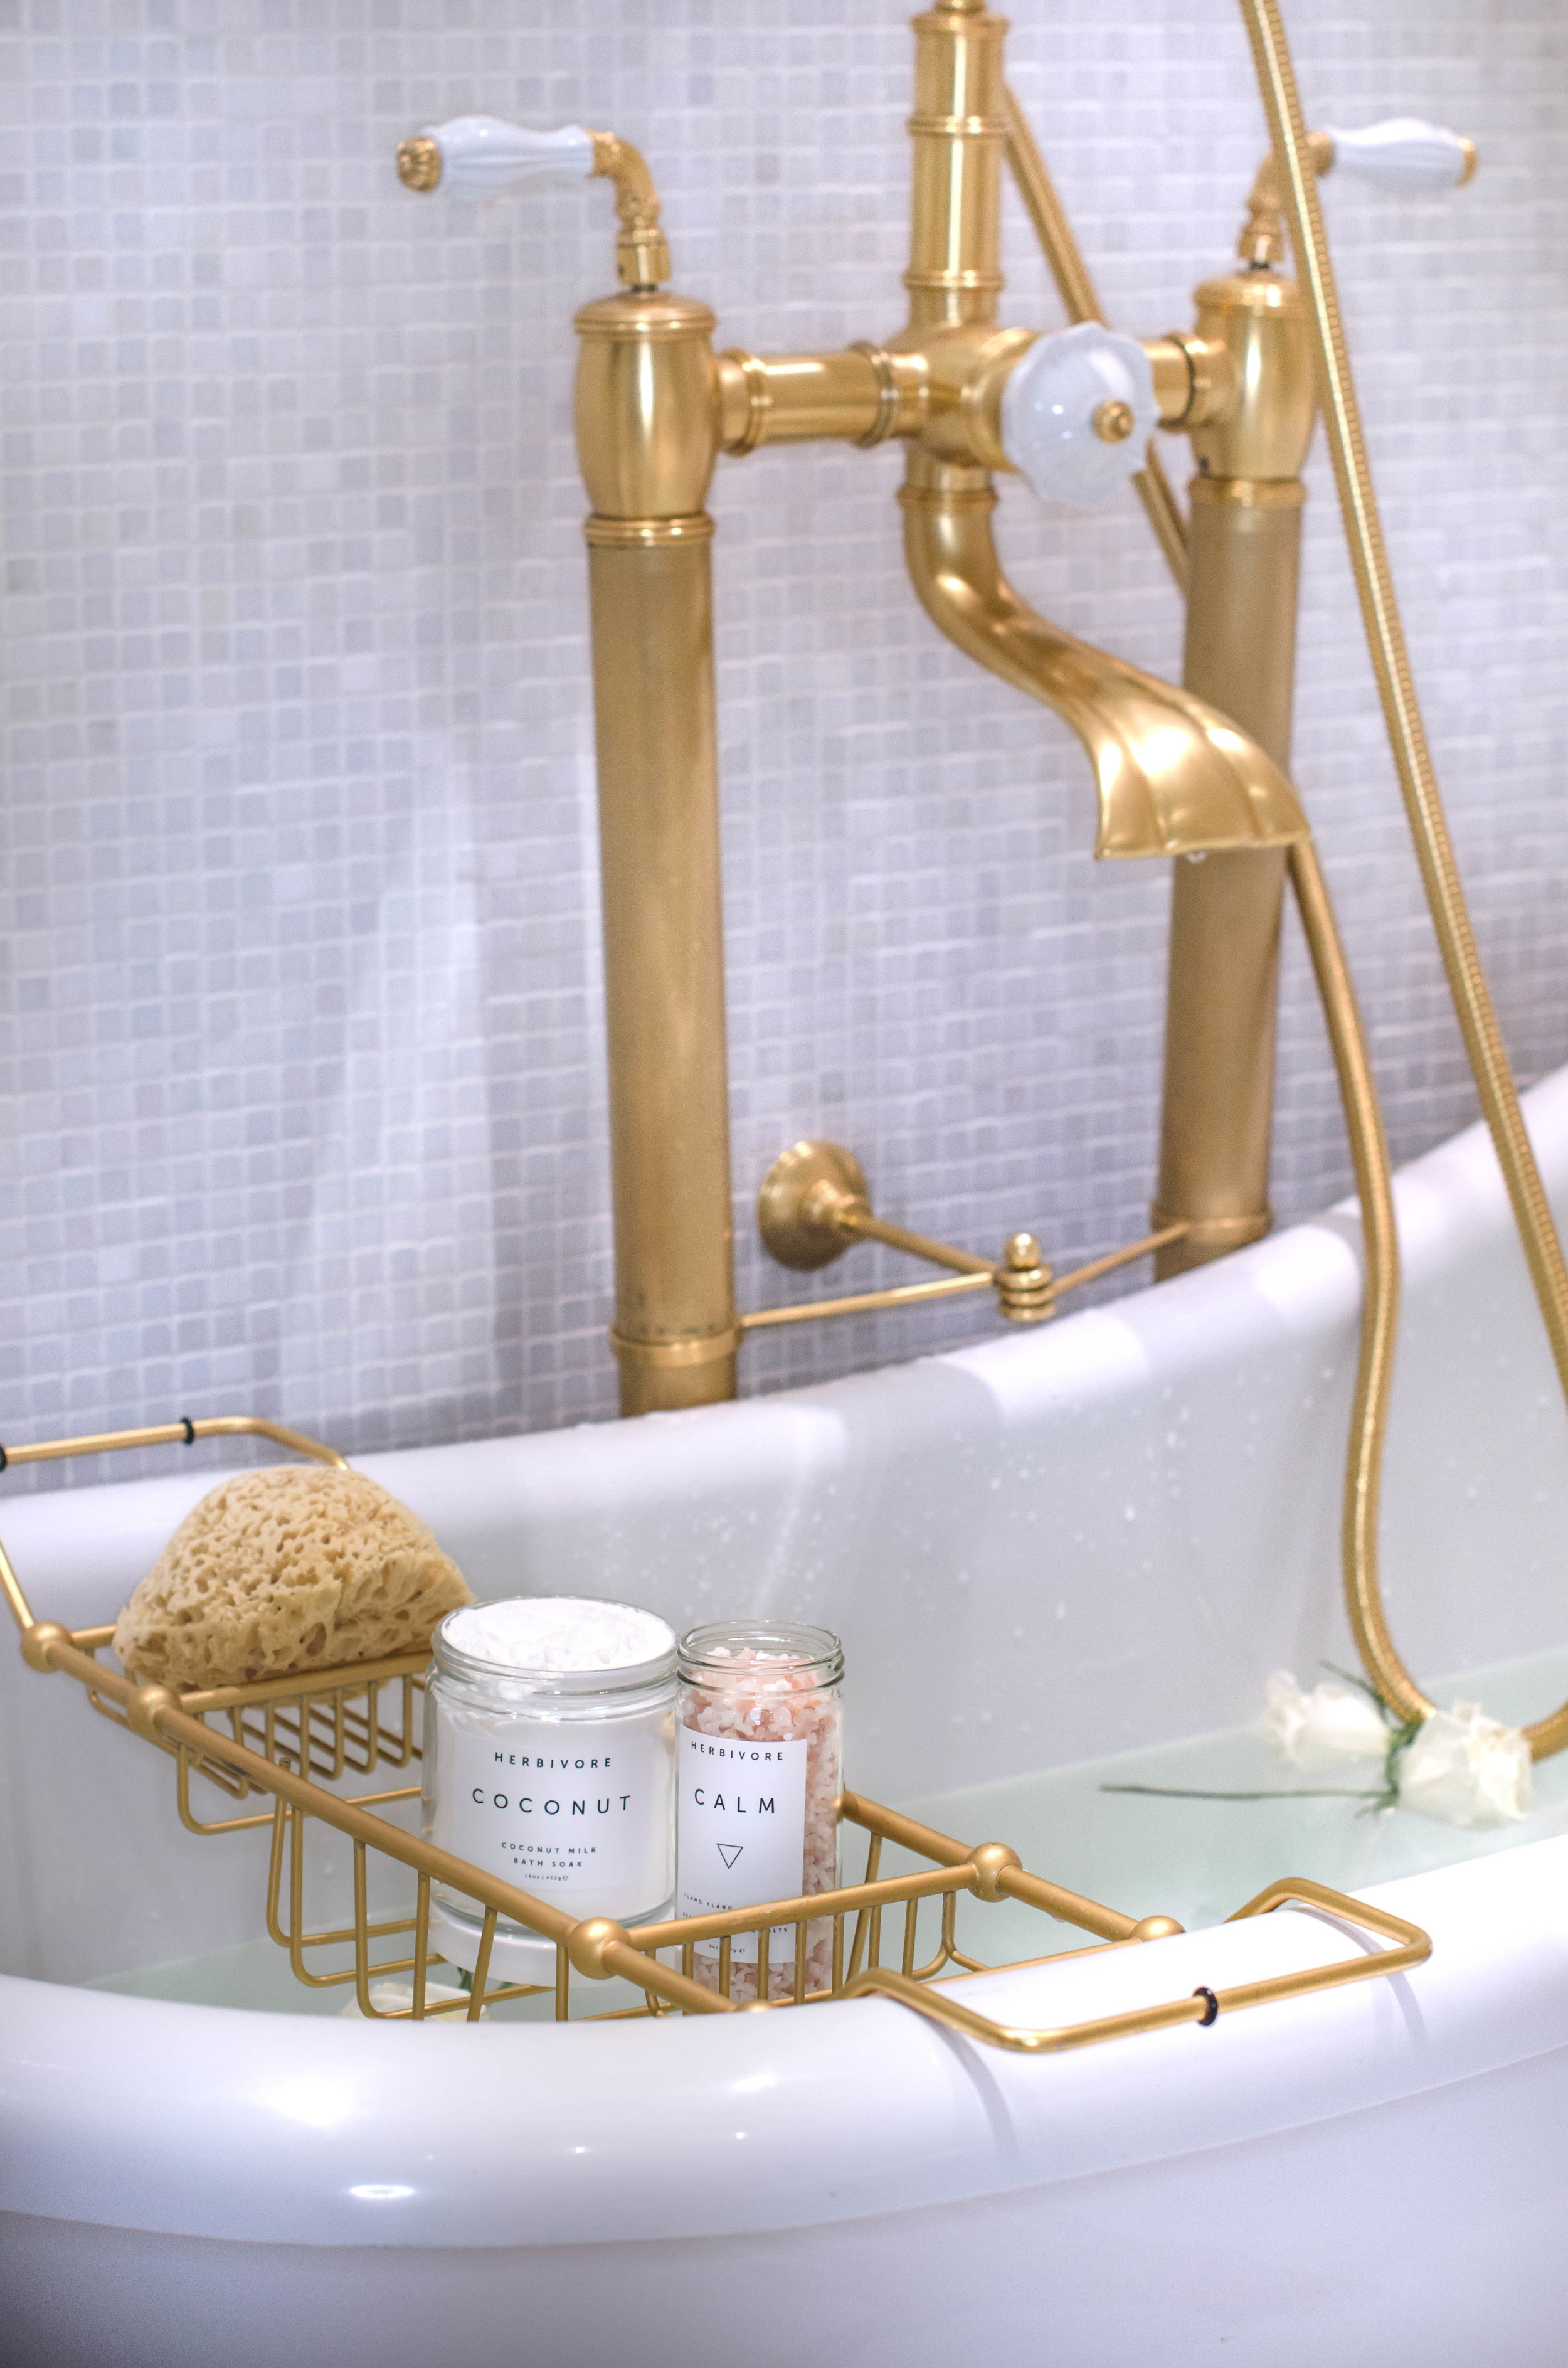 Indulge your senses and skin with Herbivore  Botanicals Coconut Milk Bath Soak  and  Calm Sea Salts